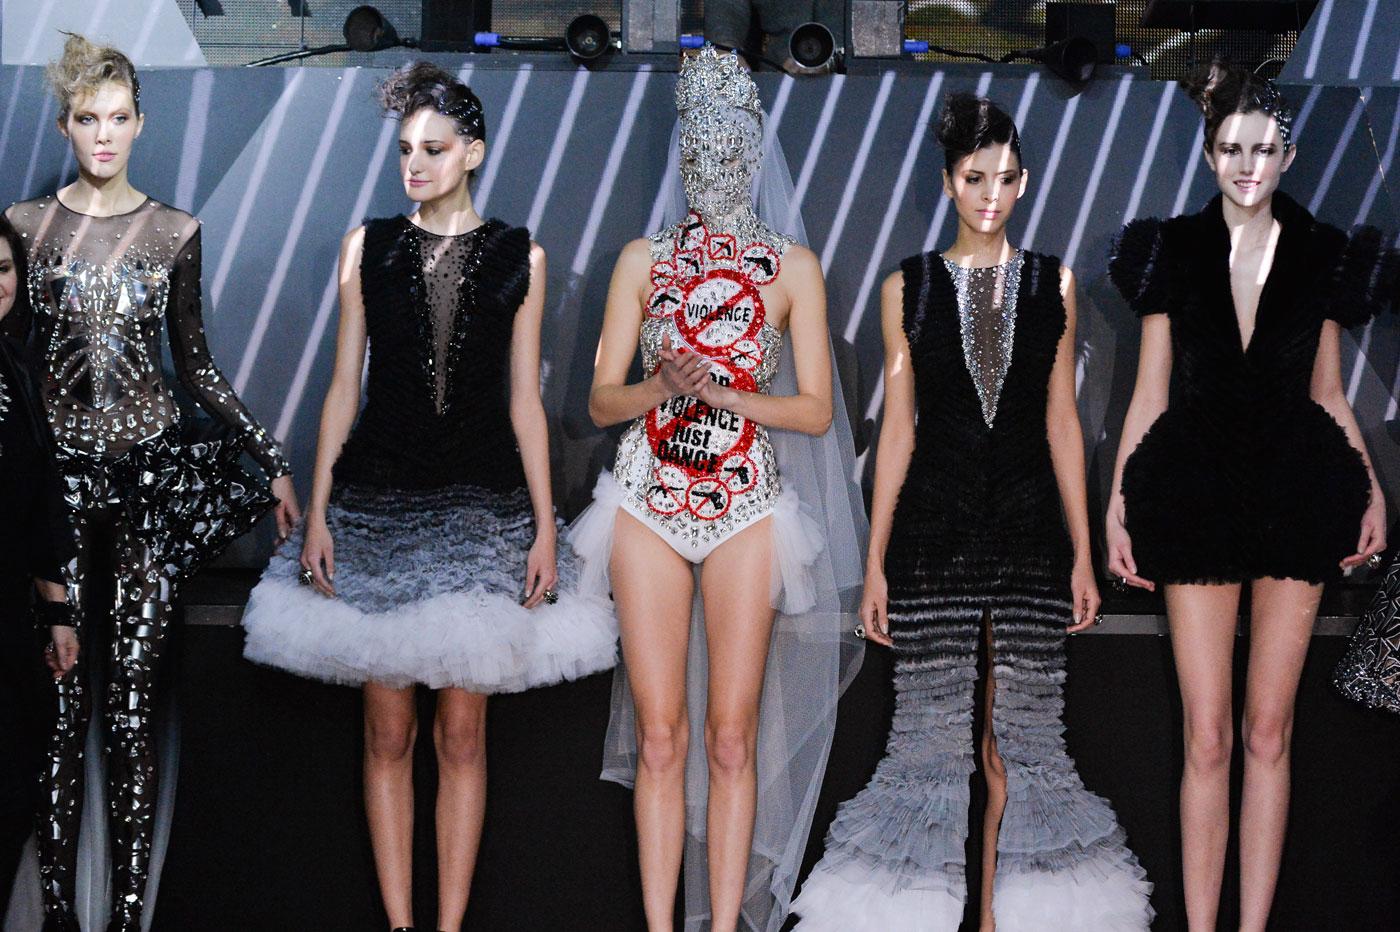 On-Aura-Tout-Vu-fashion-runway-show-haute-couture-paris-spring-summer-2015-the-impression-49